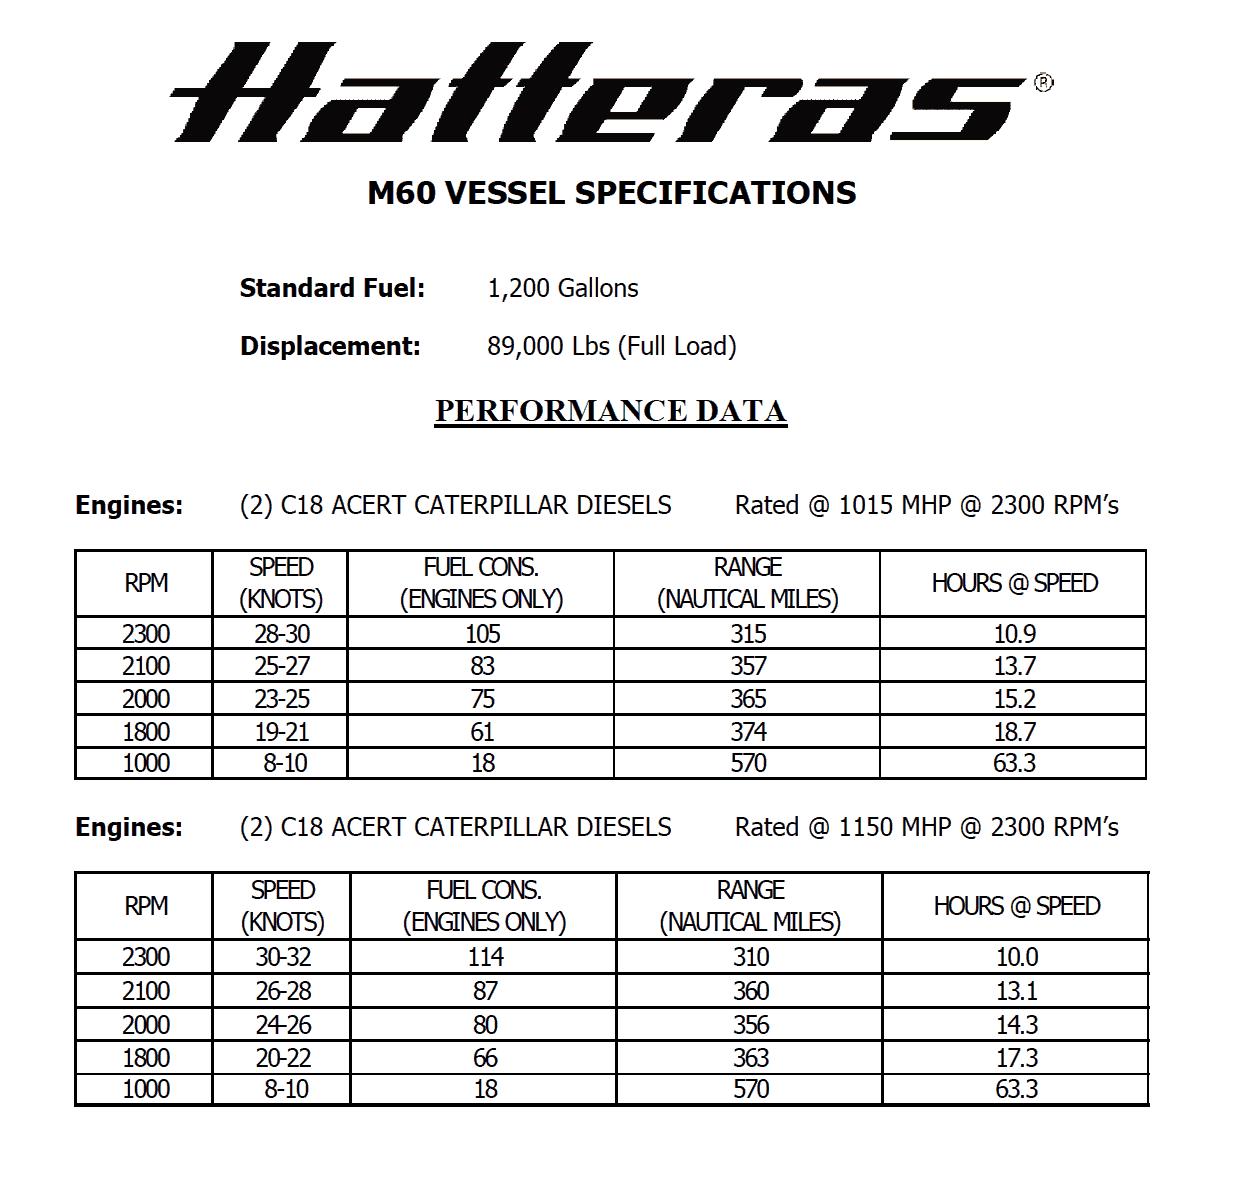 Hatteras M60 Performance Data